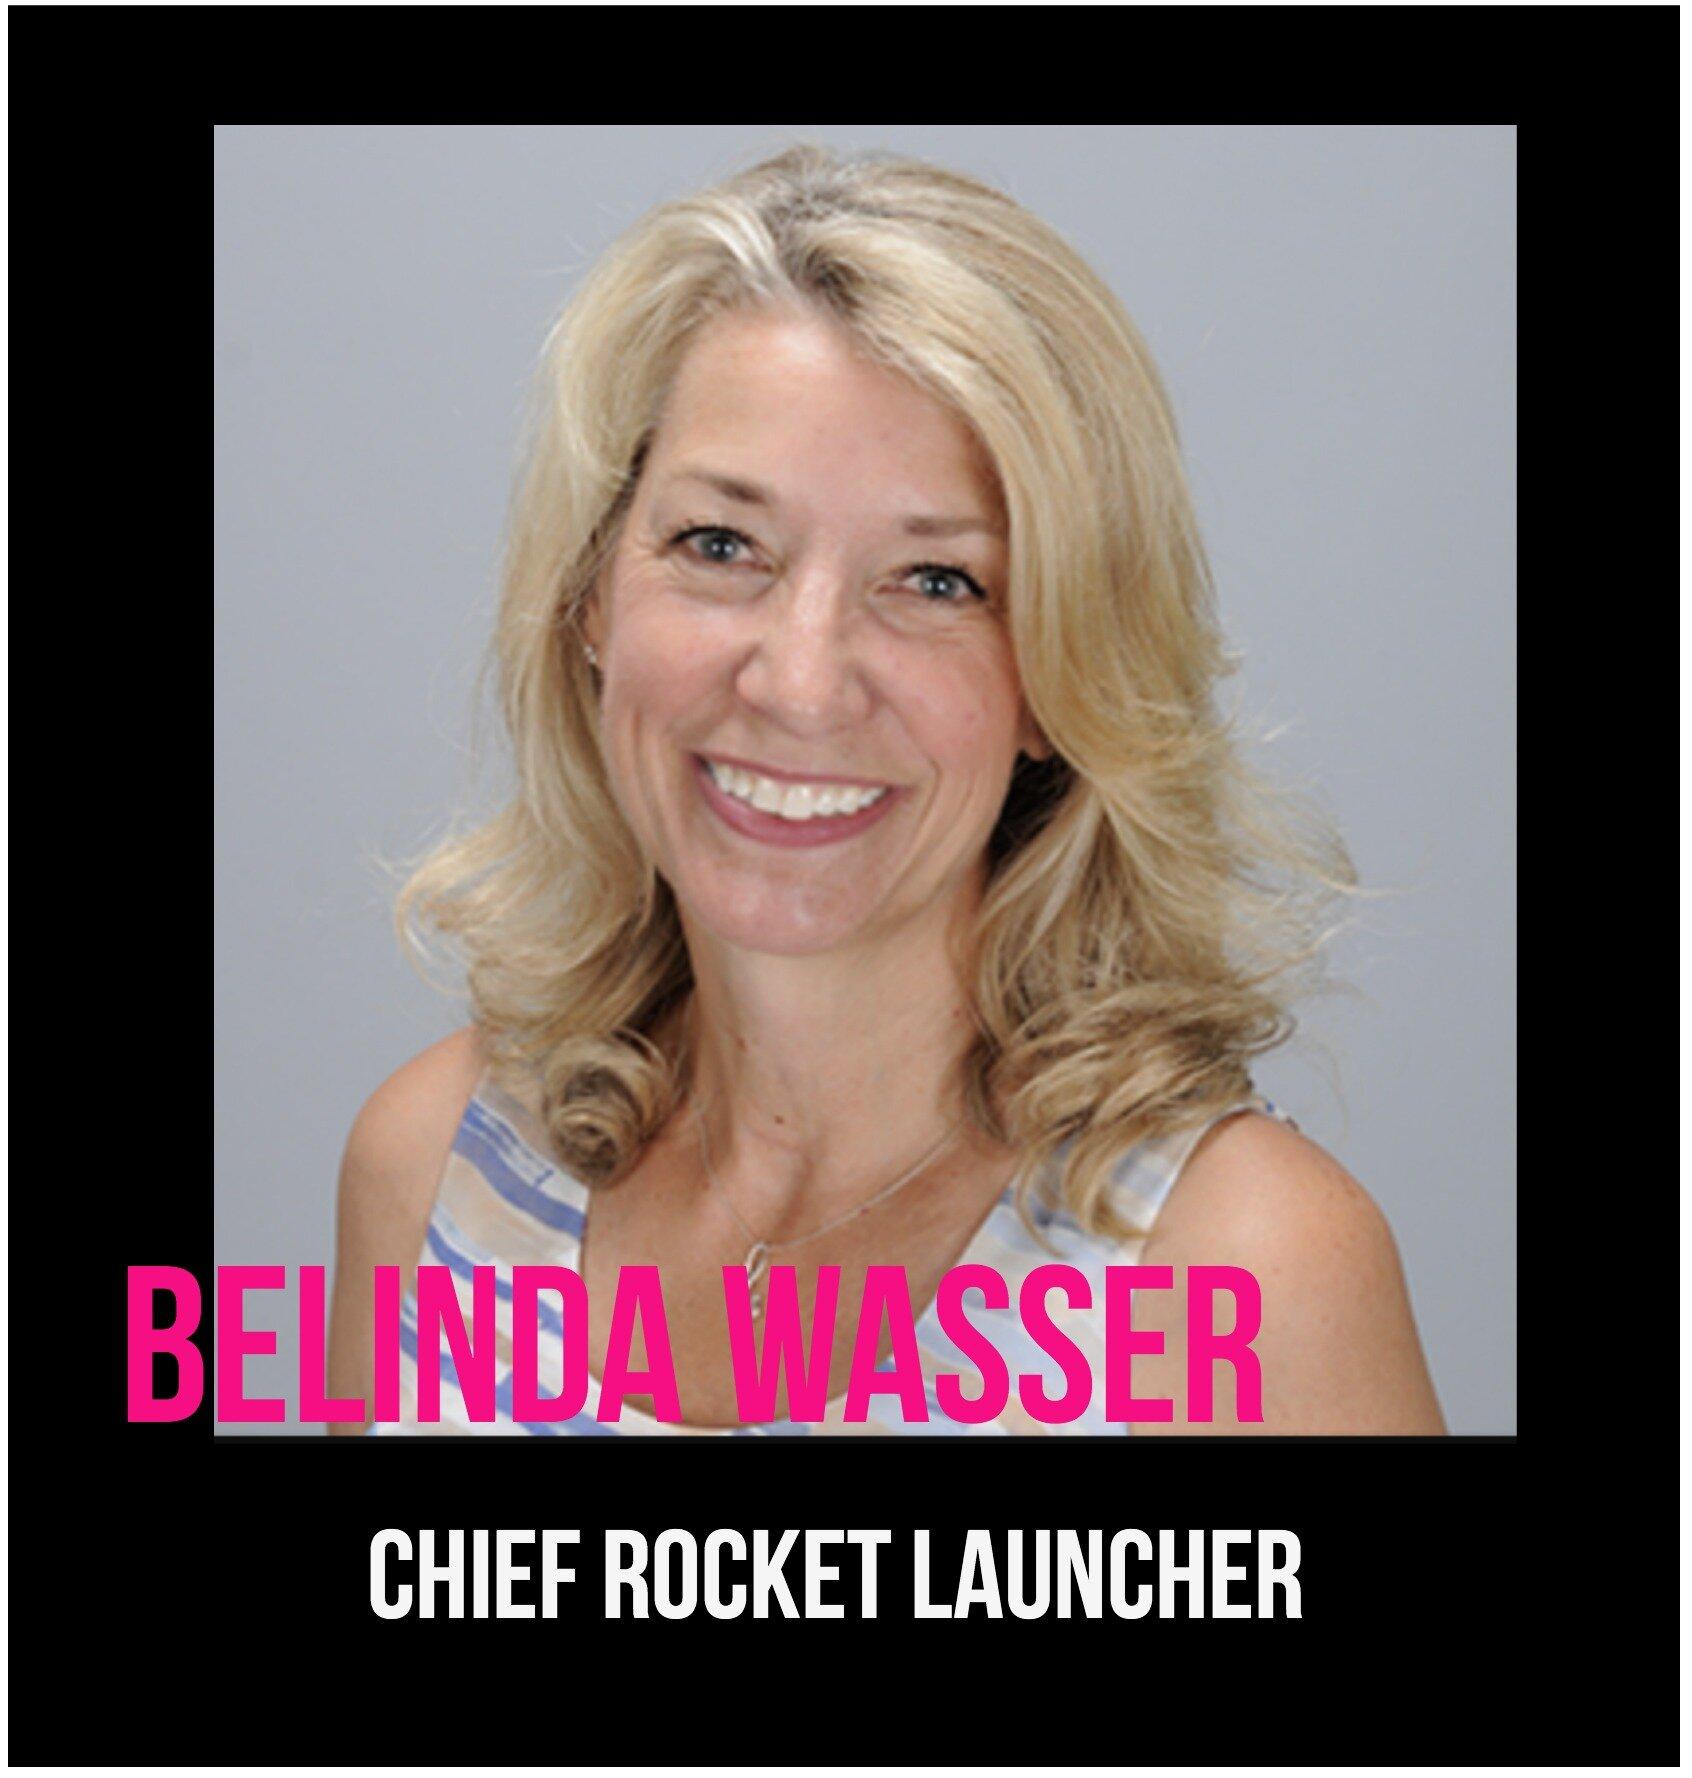 THE JILLS OF ALL TRADES™ Belinda Wasser Chief Rocket Launcher